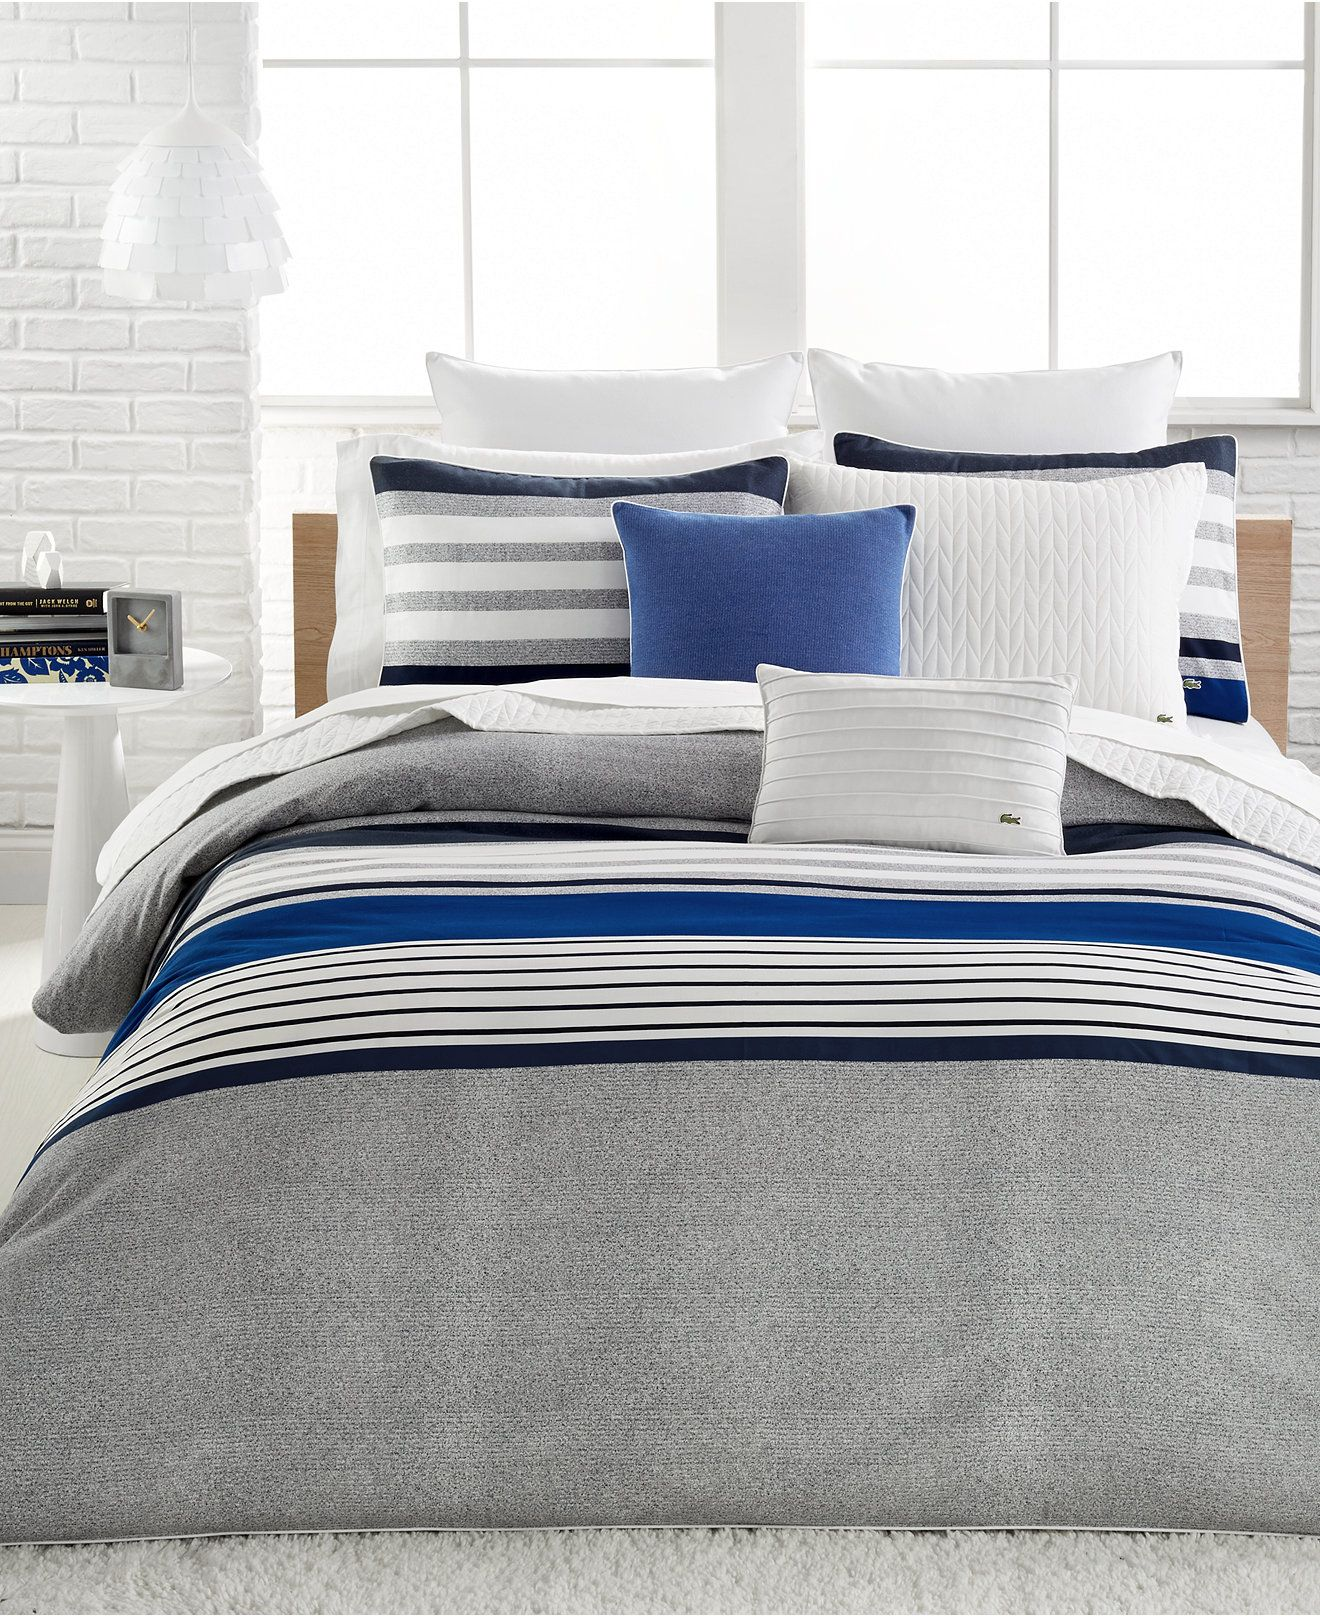 Lacoste Auckland Blue Bedding Collection, 100 Cotton